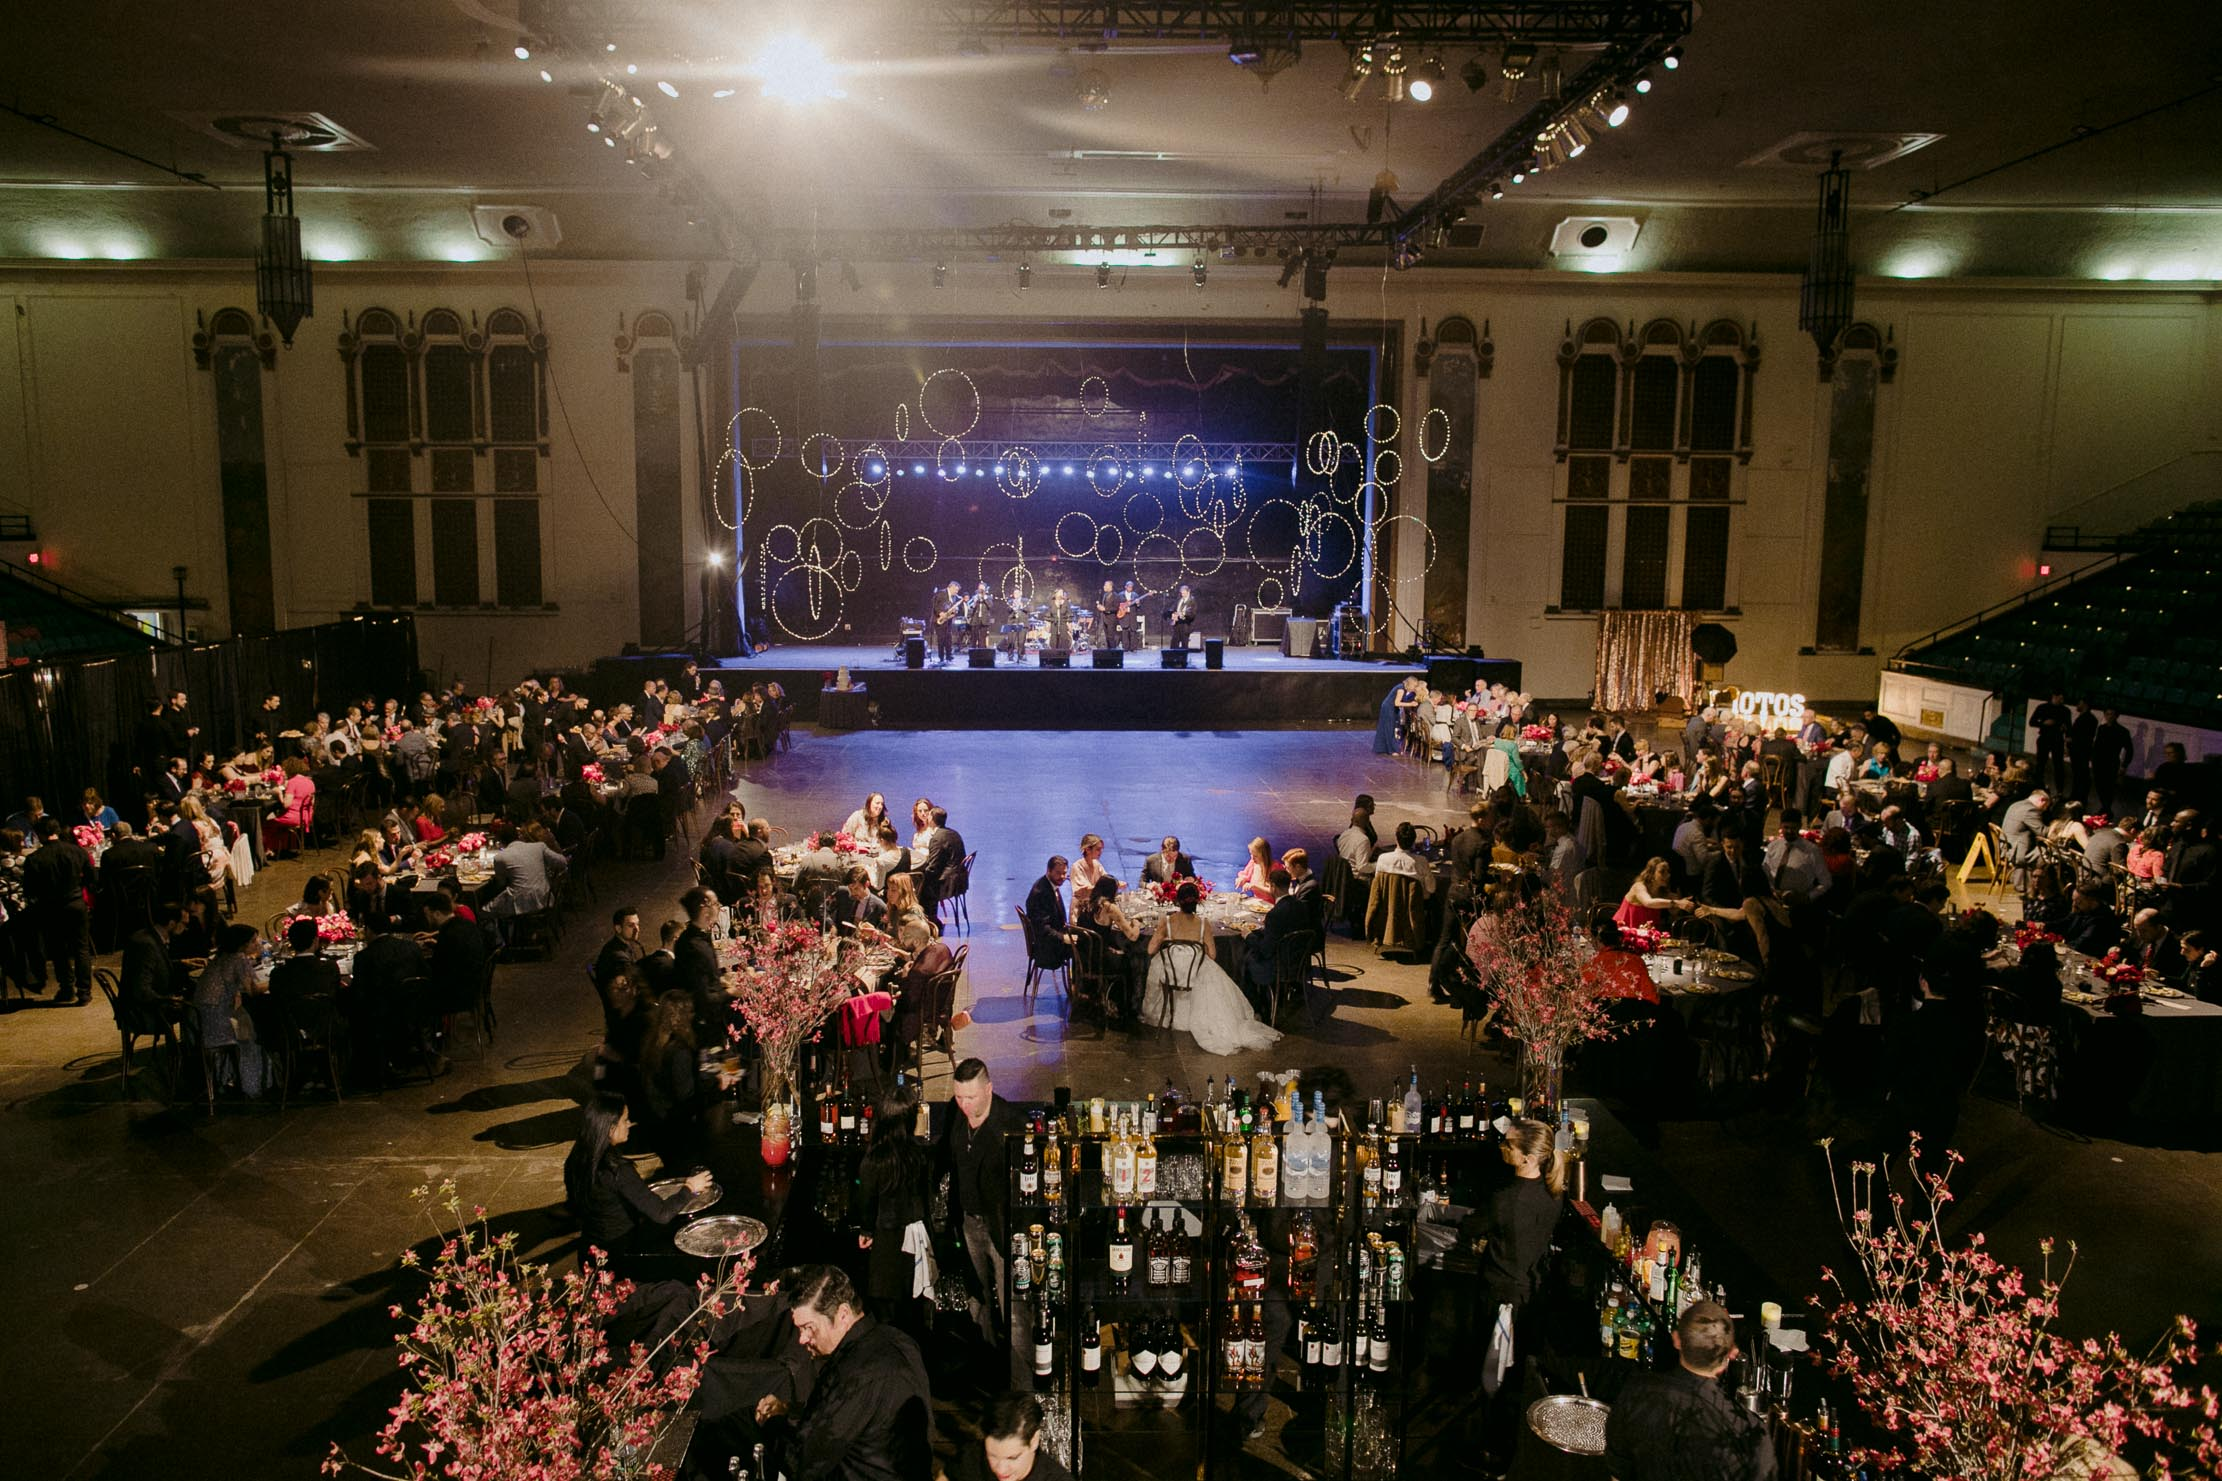 Asbury-Park-Convention-Hall-Wedding-2104.jpg